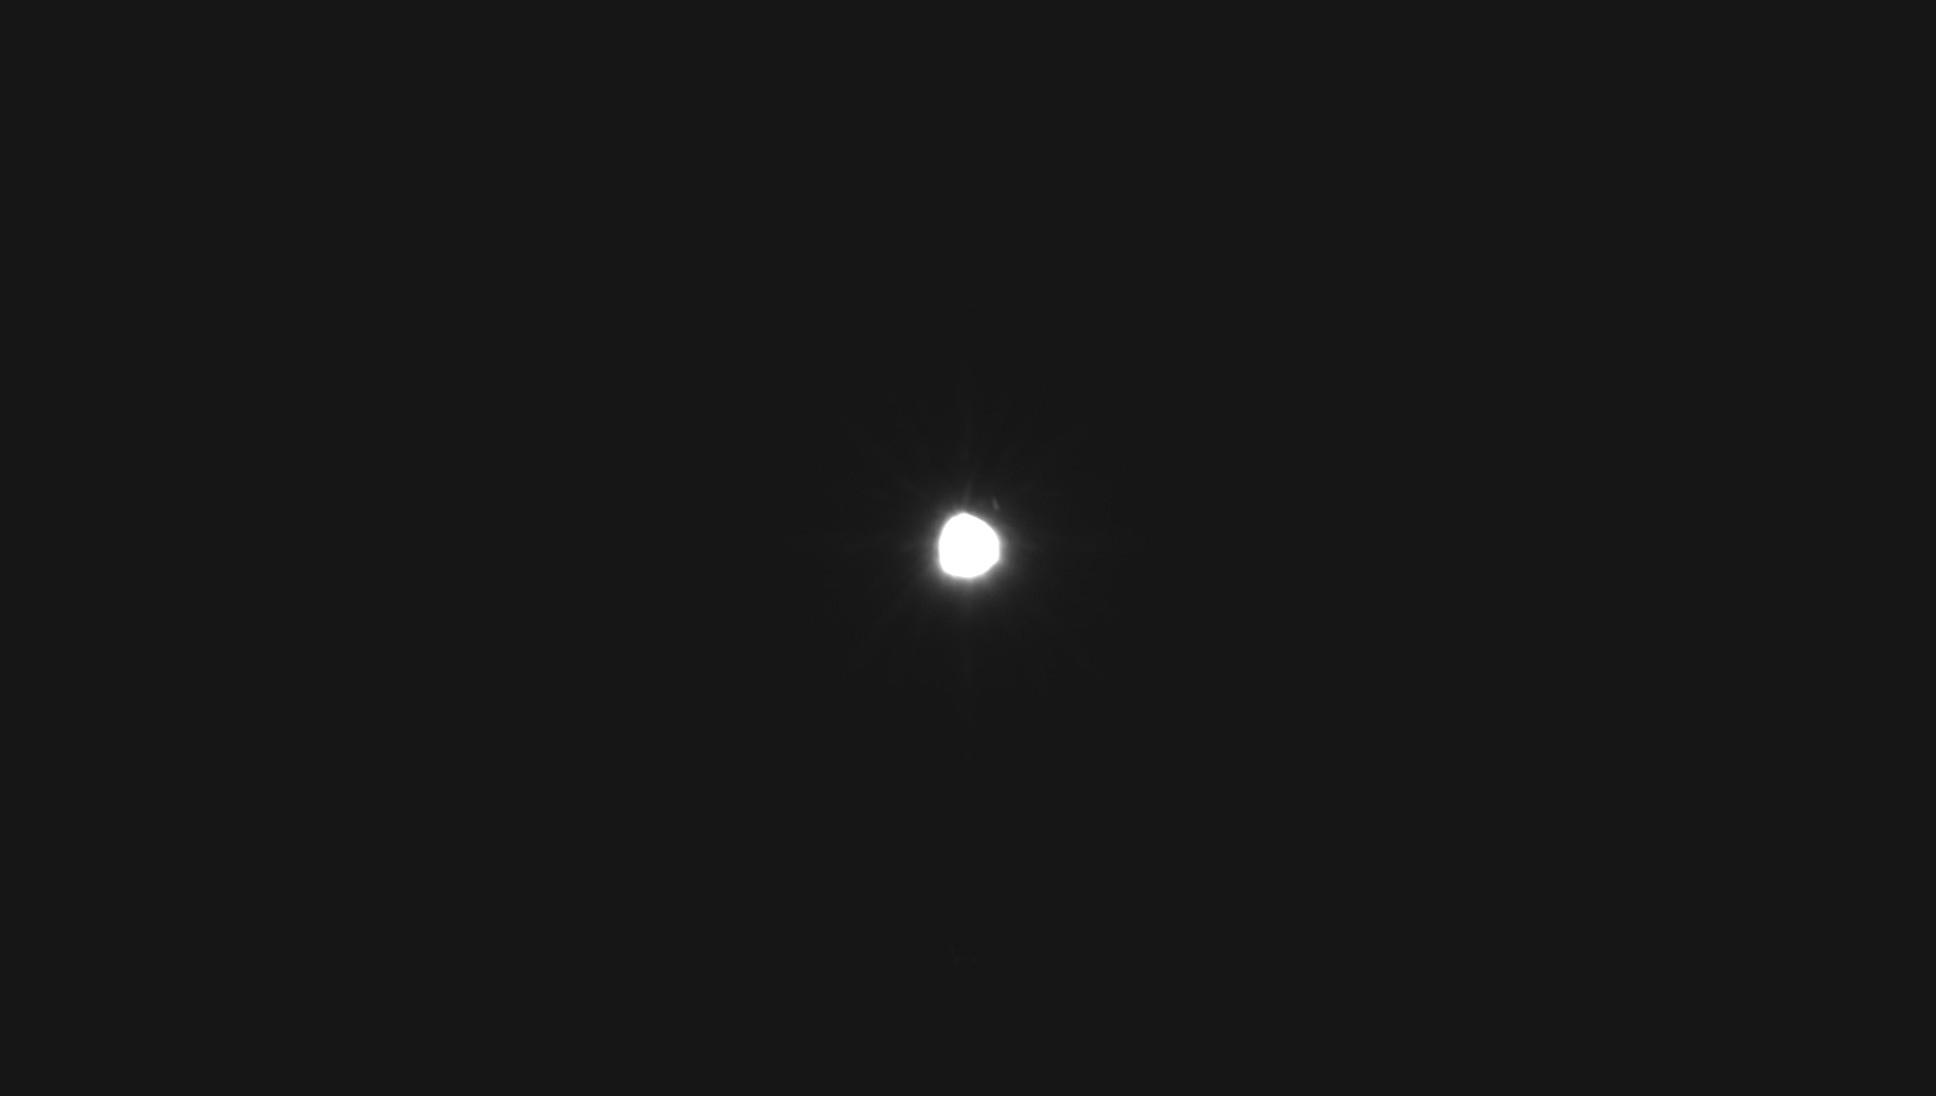 5e7f4b7c509f4_SiriusAB2020-03-18-2003_5-CapObjTER.jpg.1d0899d52152e40a38ea7d2b10c3522a.jpg